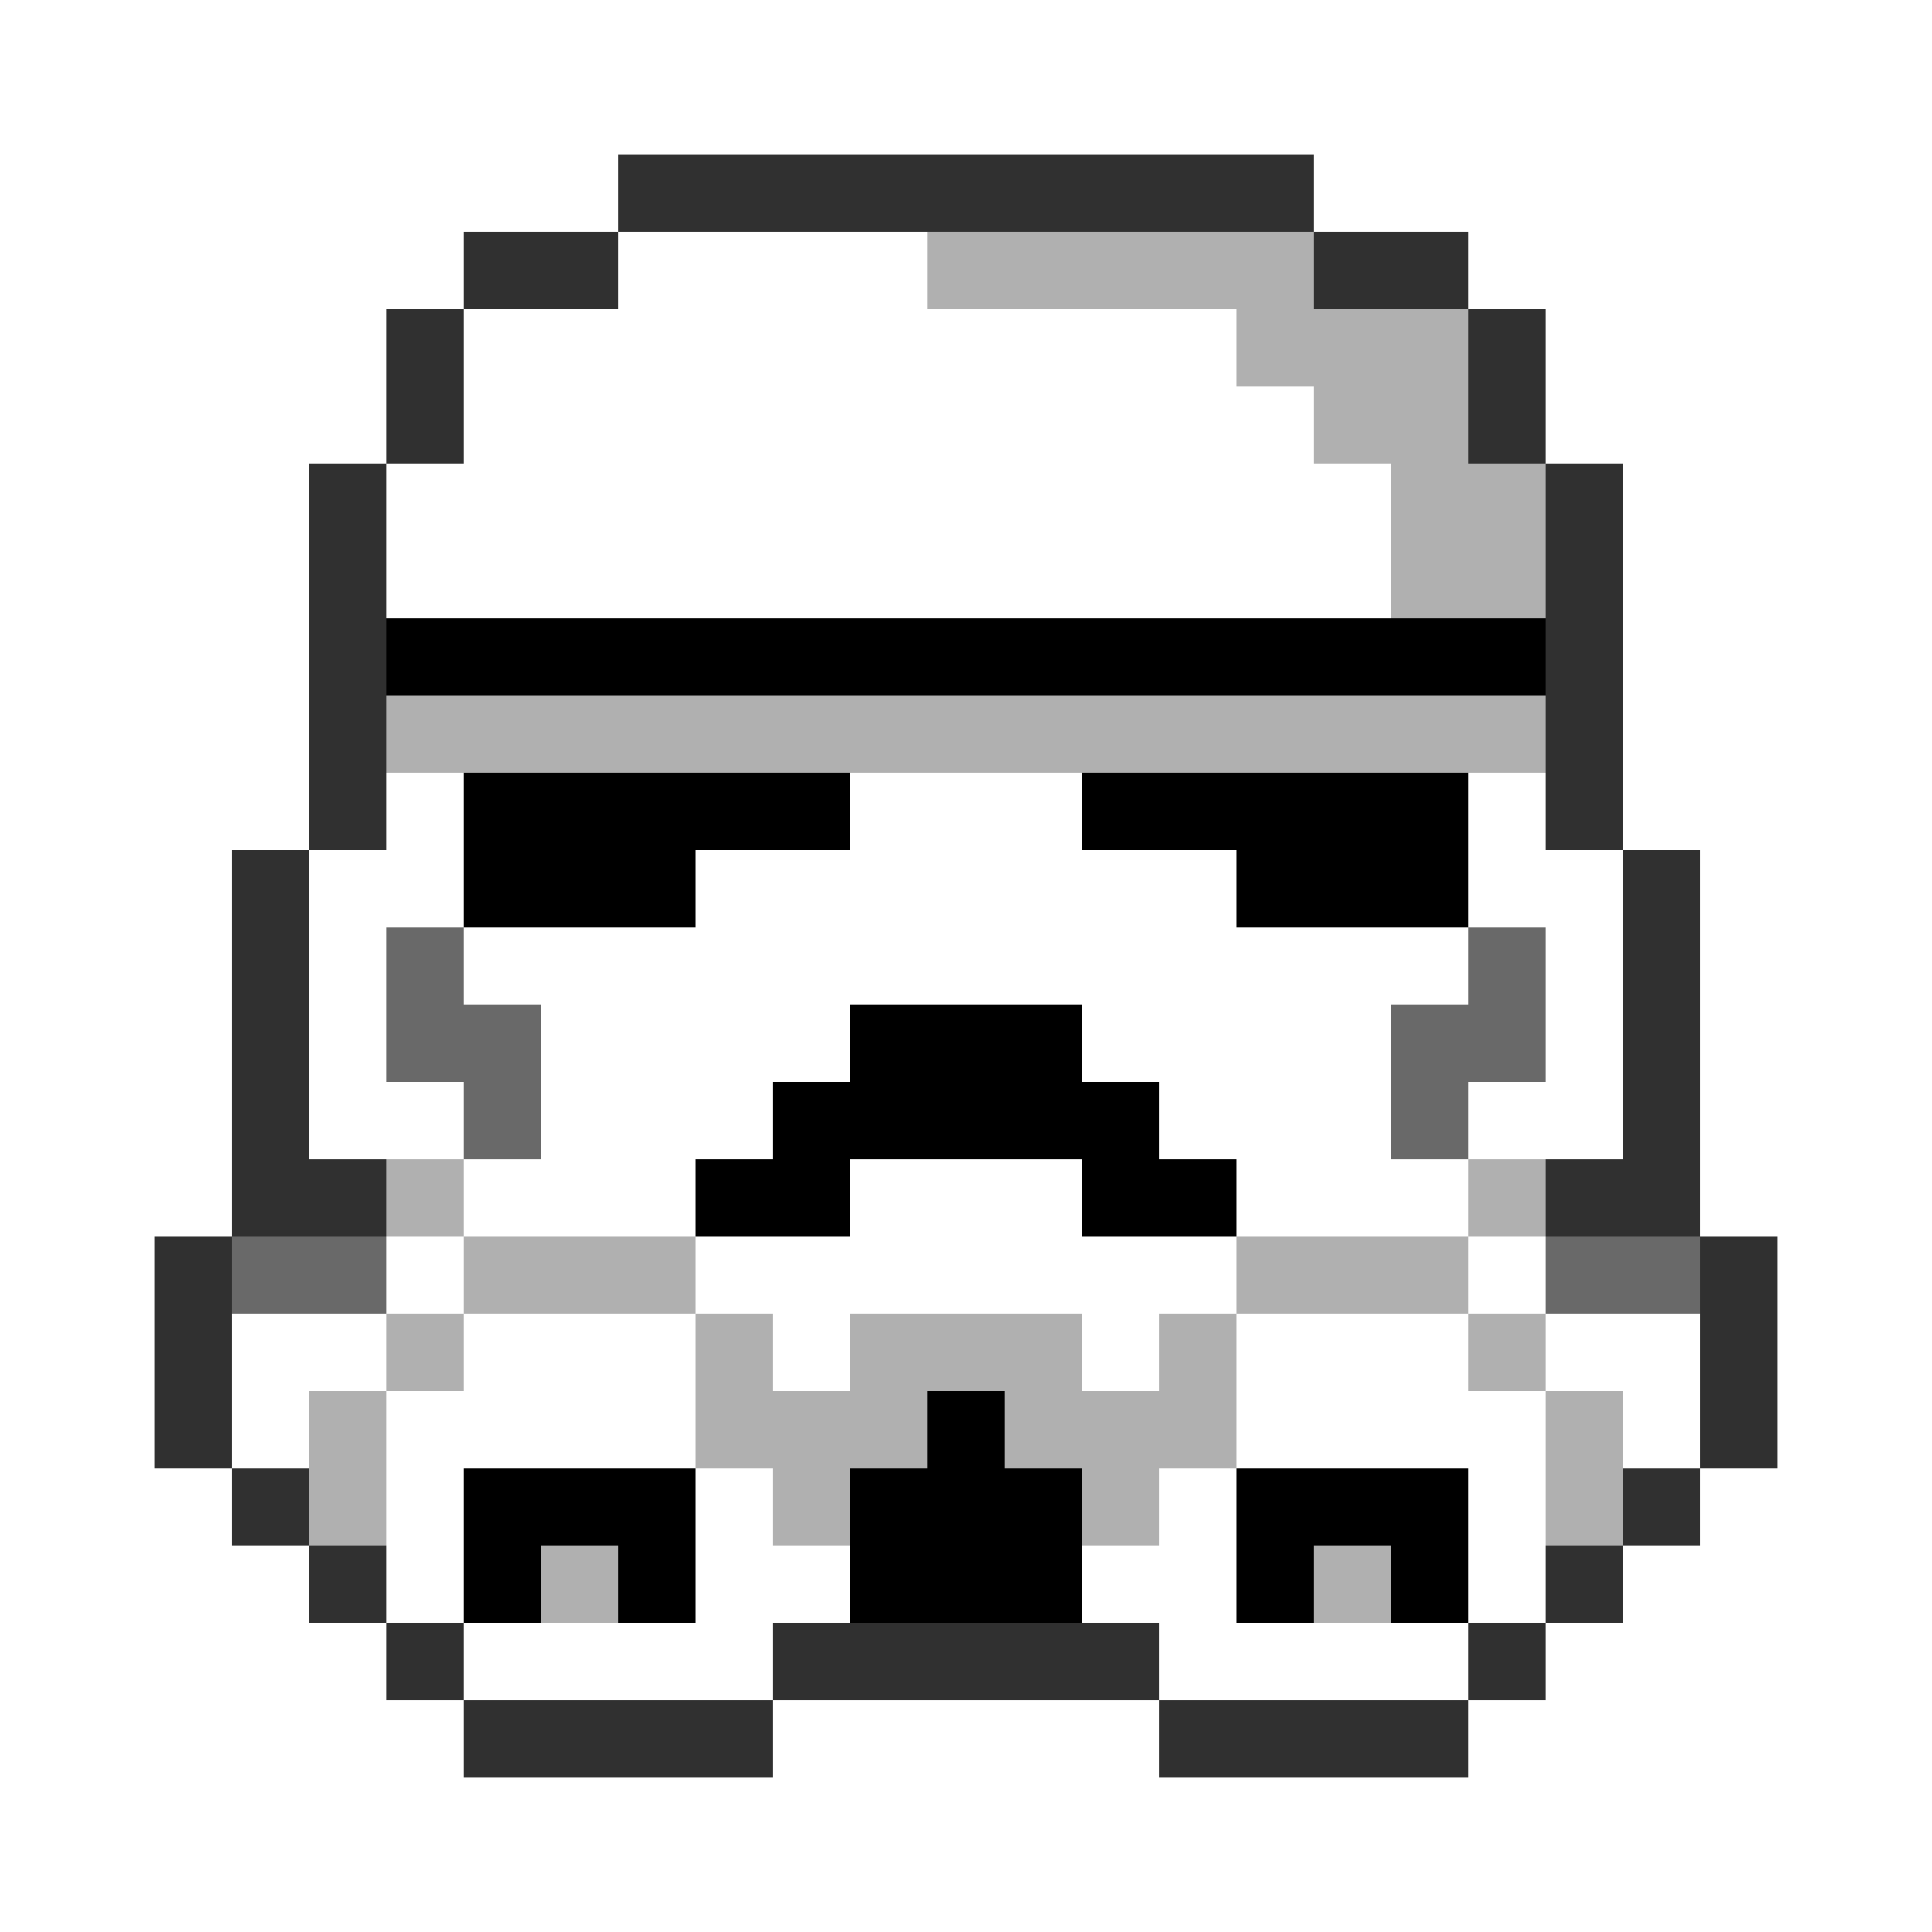 Starwars Pixel Art Maker